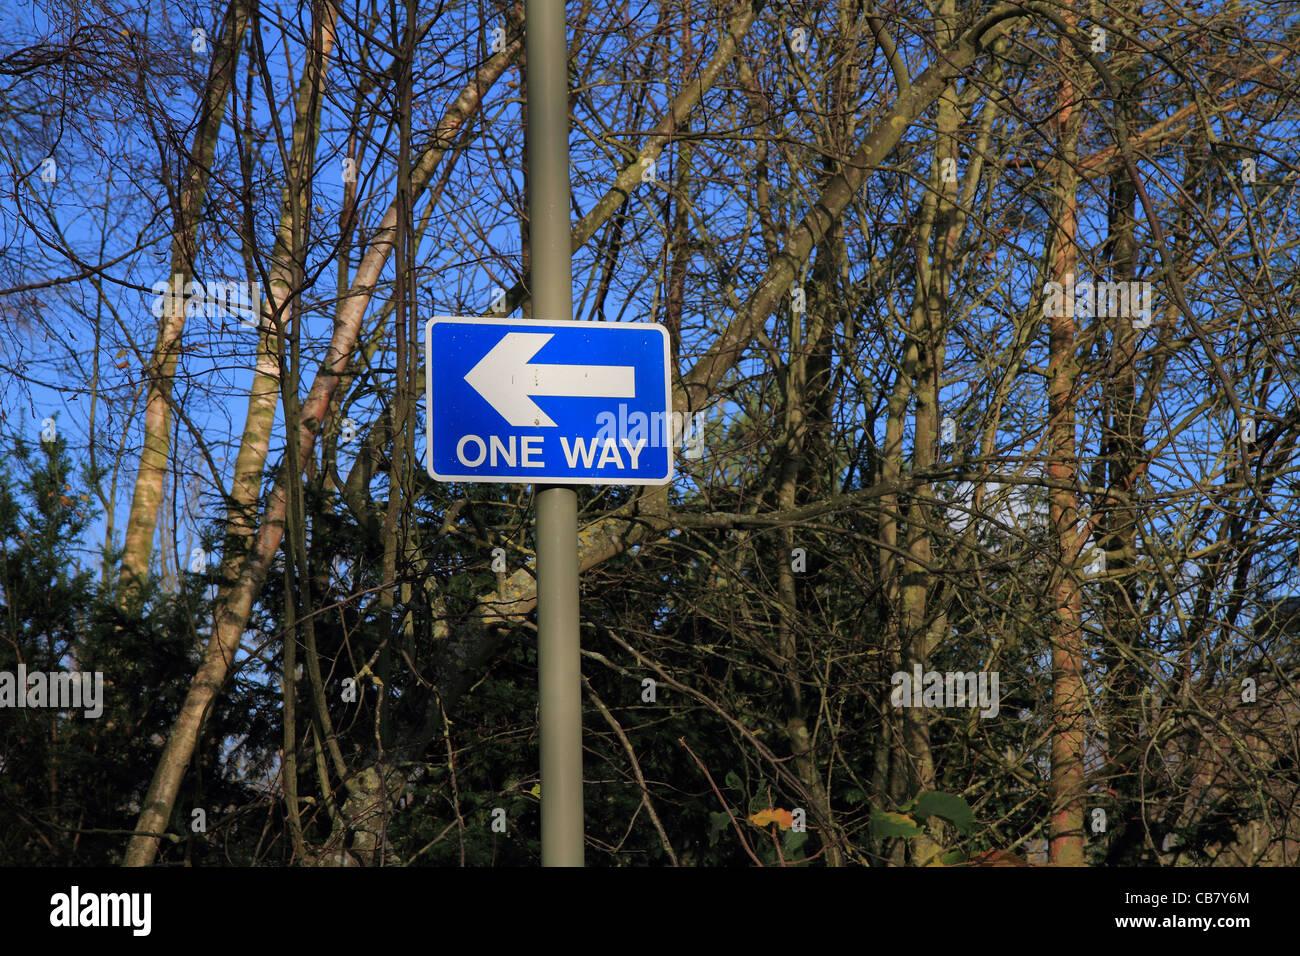 Una manera firmar flecha blanca sobre fondo azul. Imagen De Stock